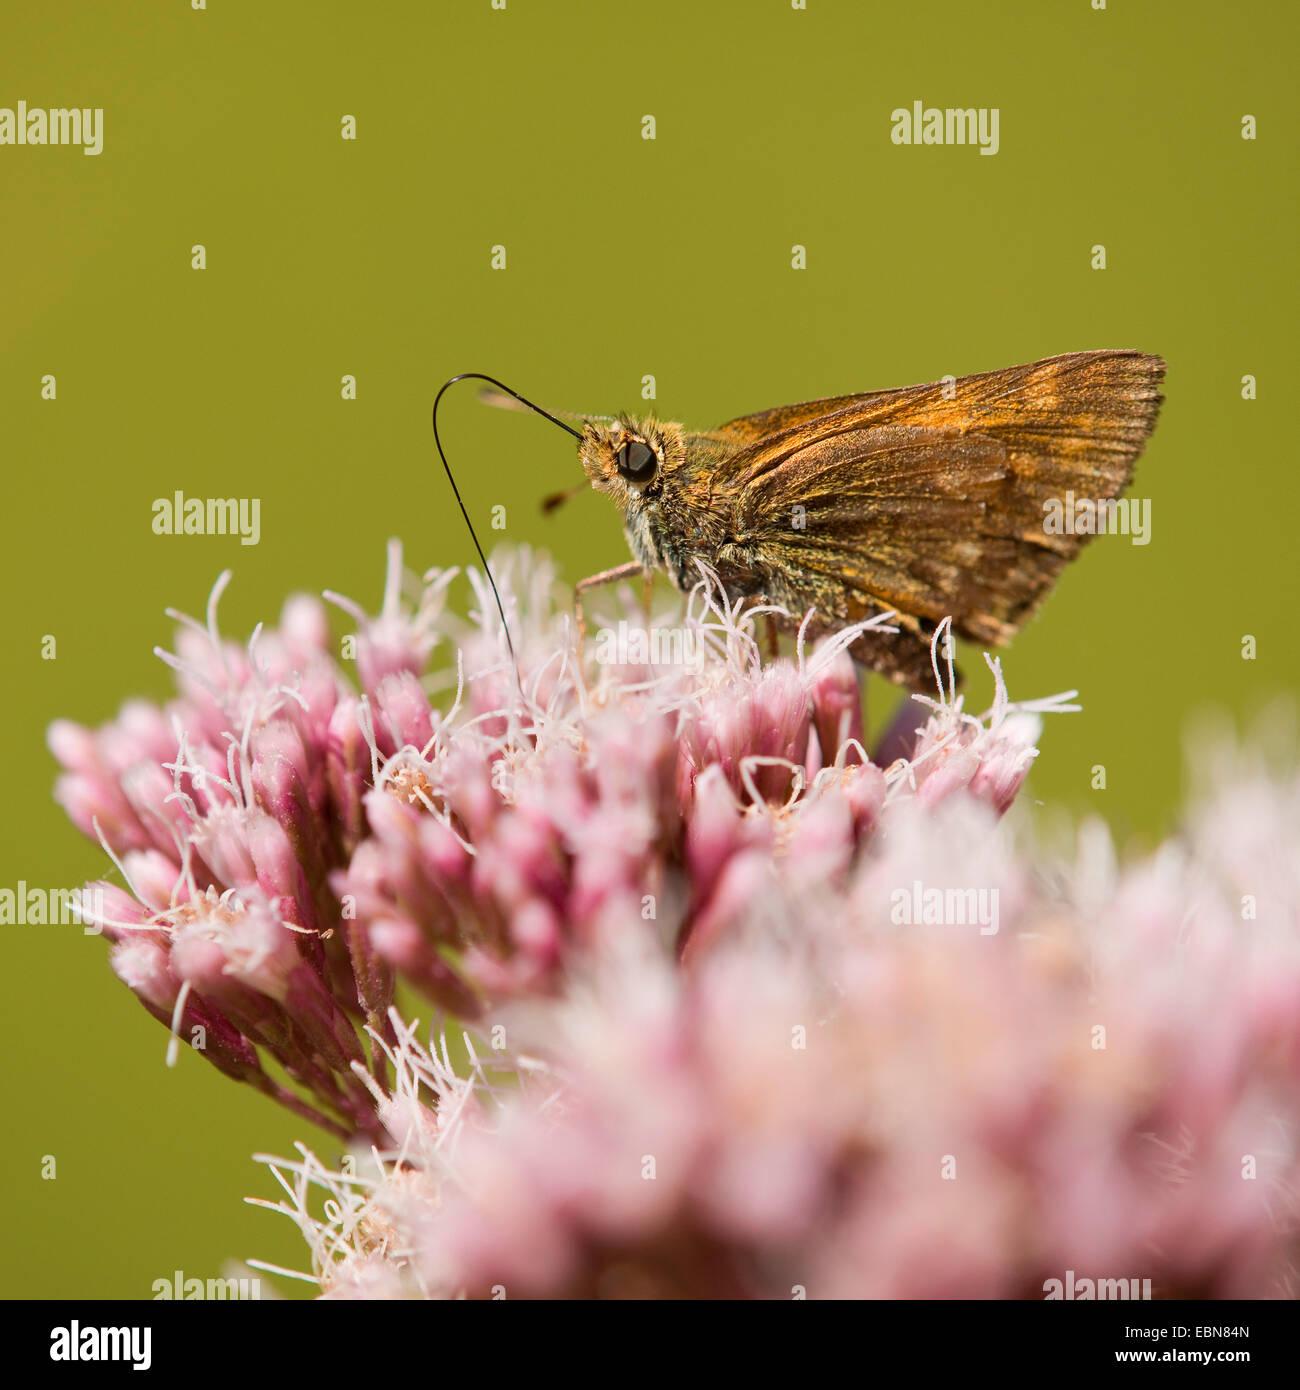 Gran Capitán (Ochlodes venatus, Ochlodes sylvanus Ochlodes venata,), chupando el néctar de una flor de cáñamo-agrimony, Alemania Foto de stock